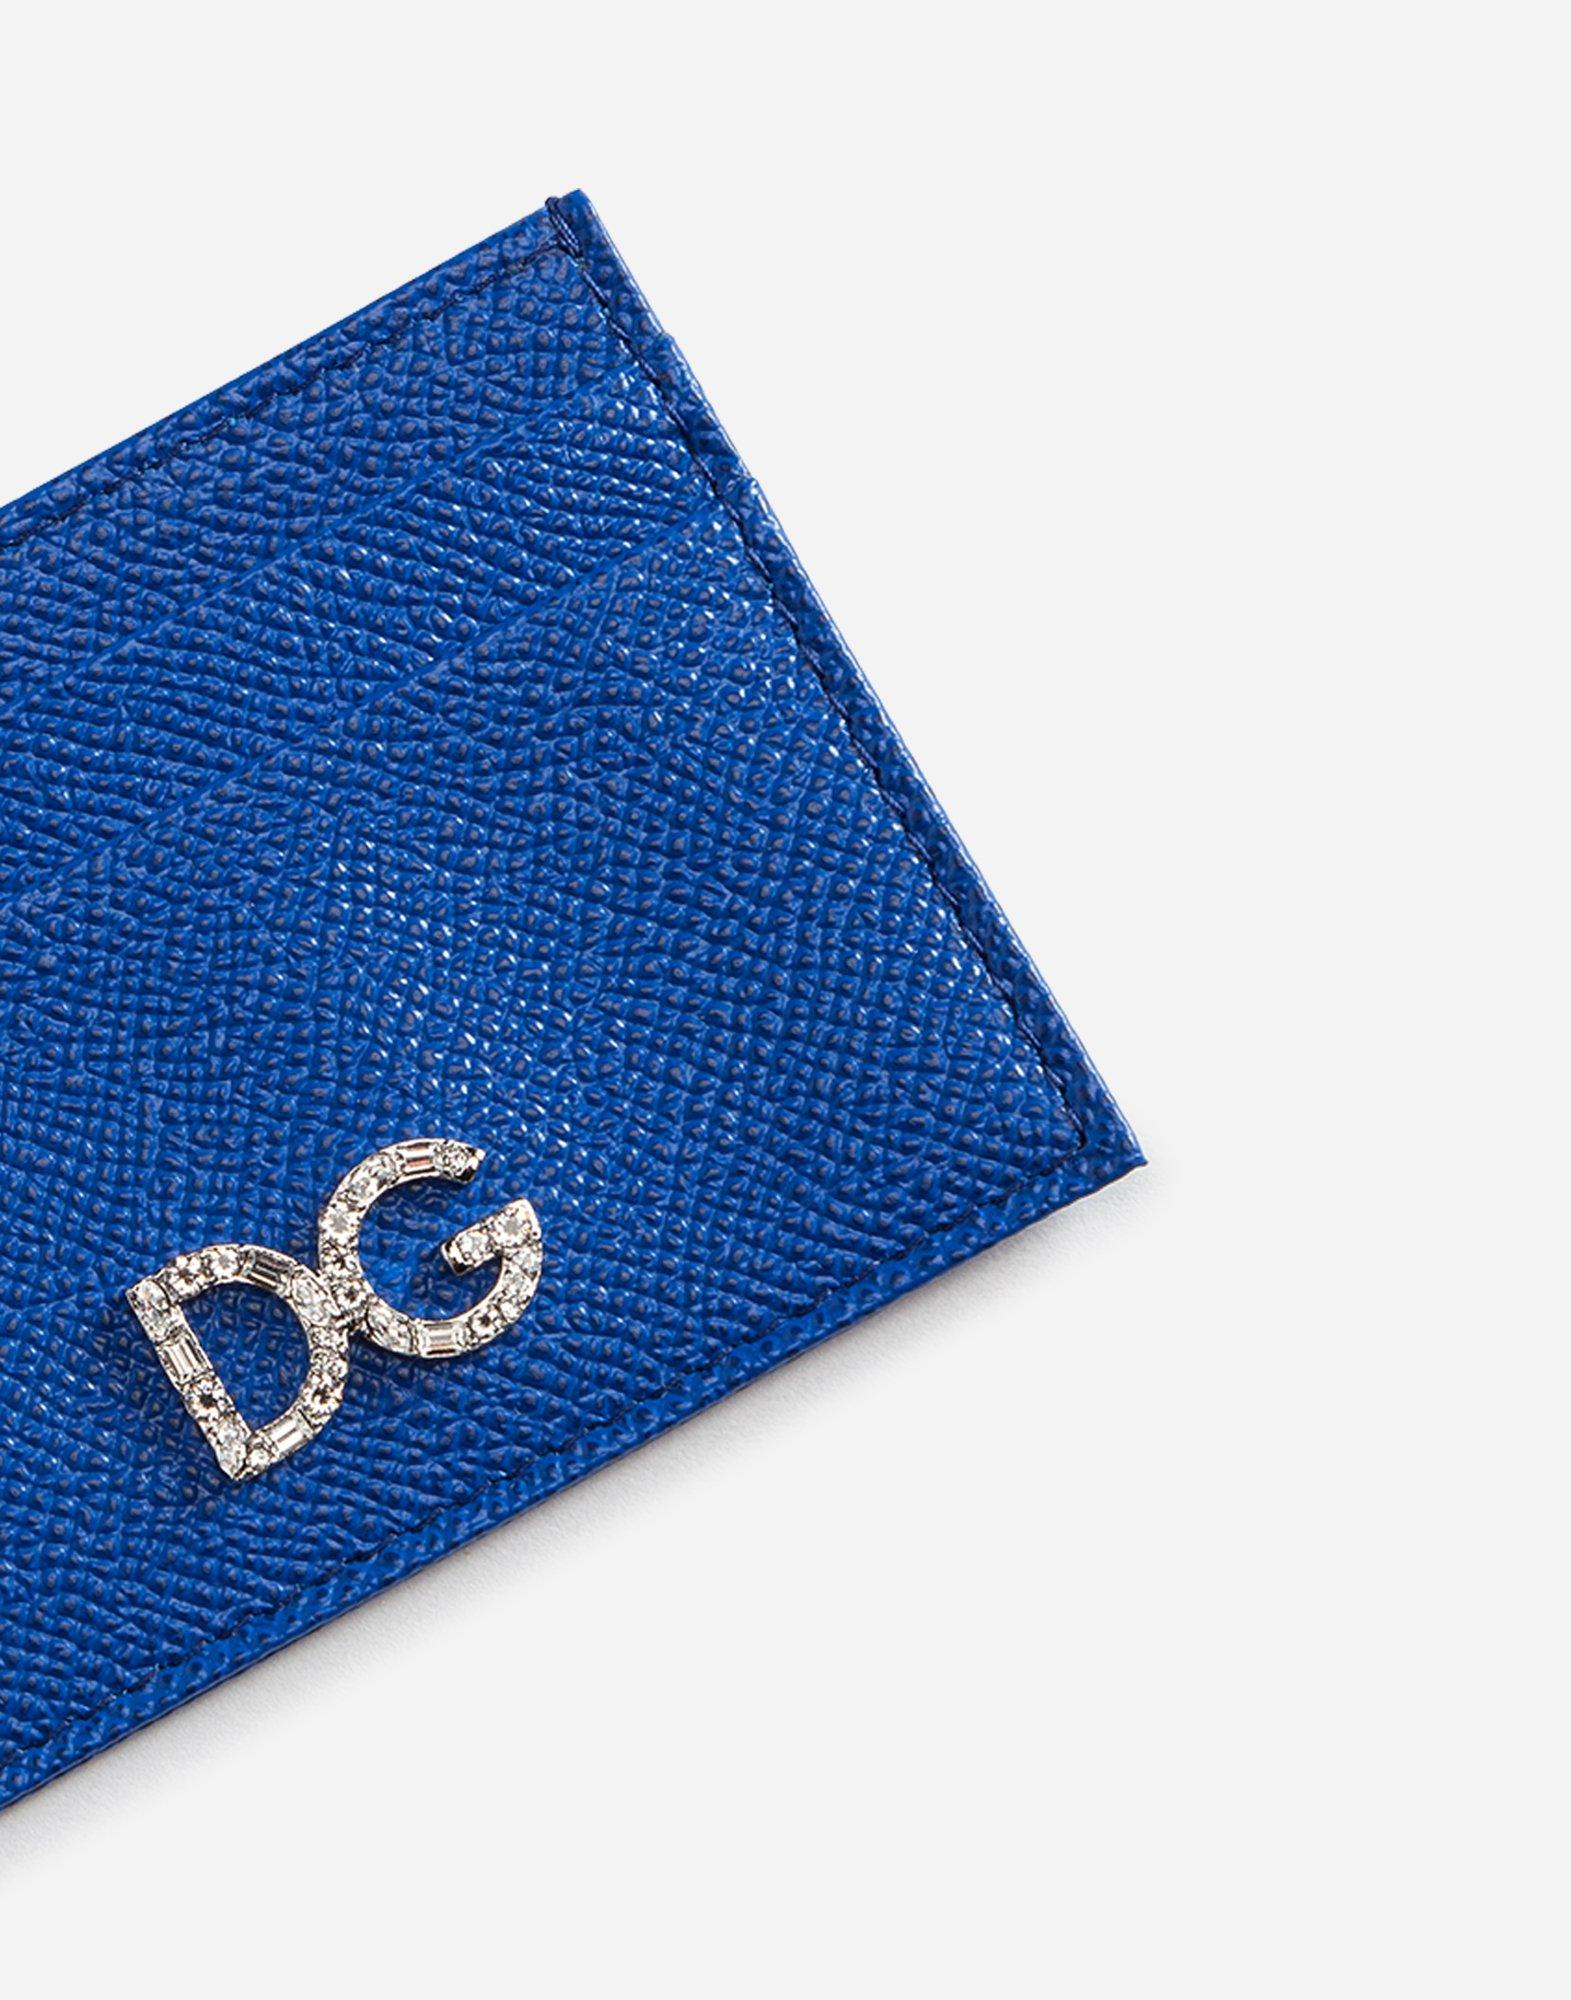 DAUPHINE CALFSKIN CARD HOLDER WITH DG CRYSTAL LOGO